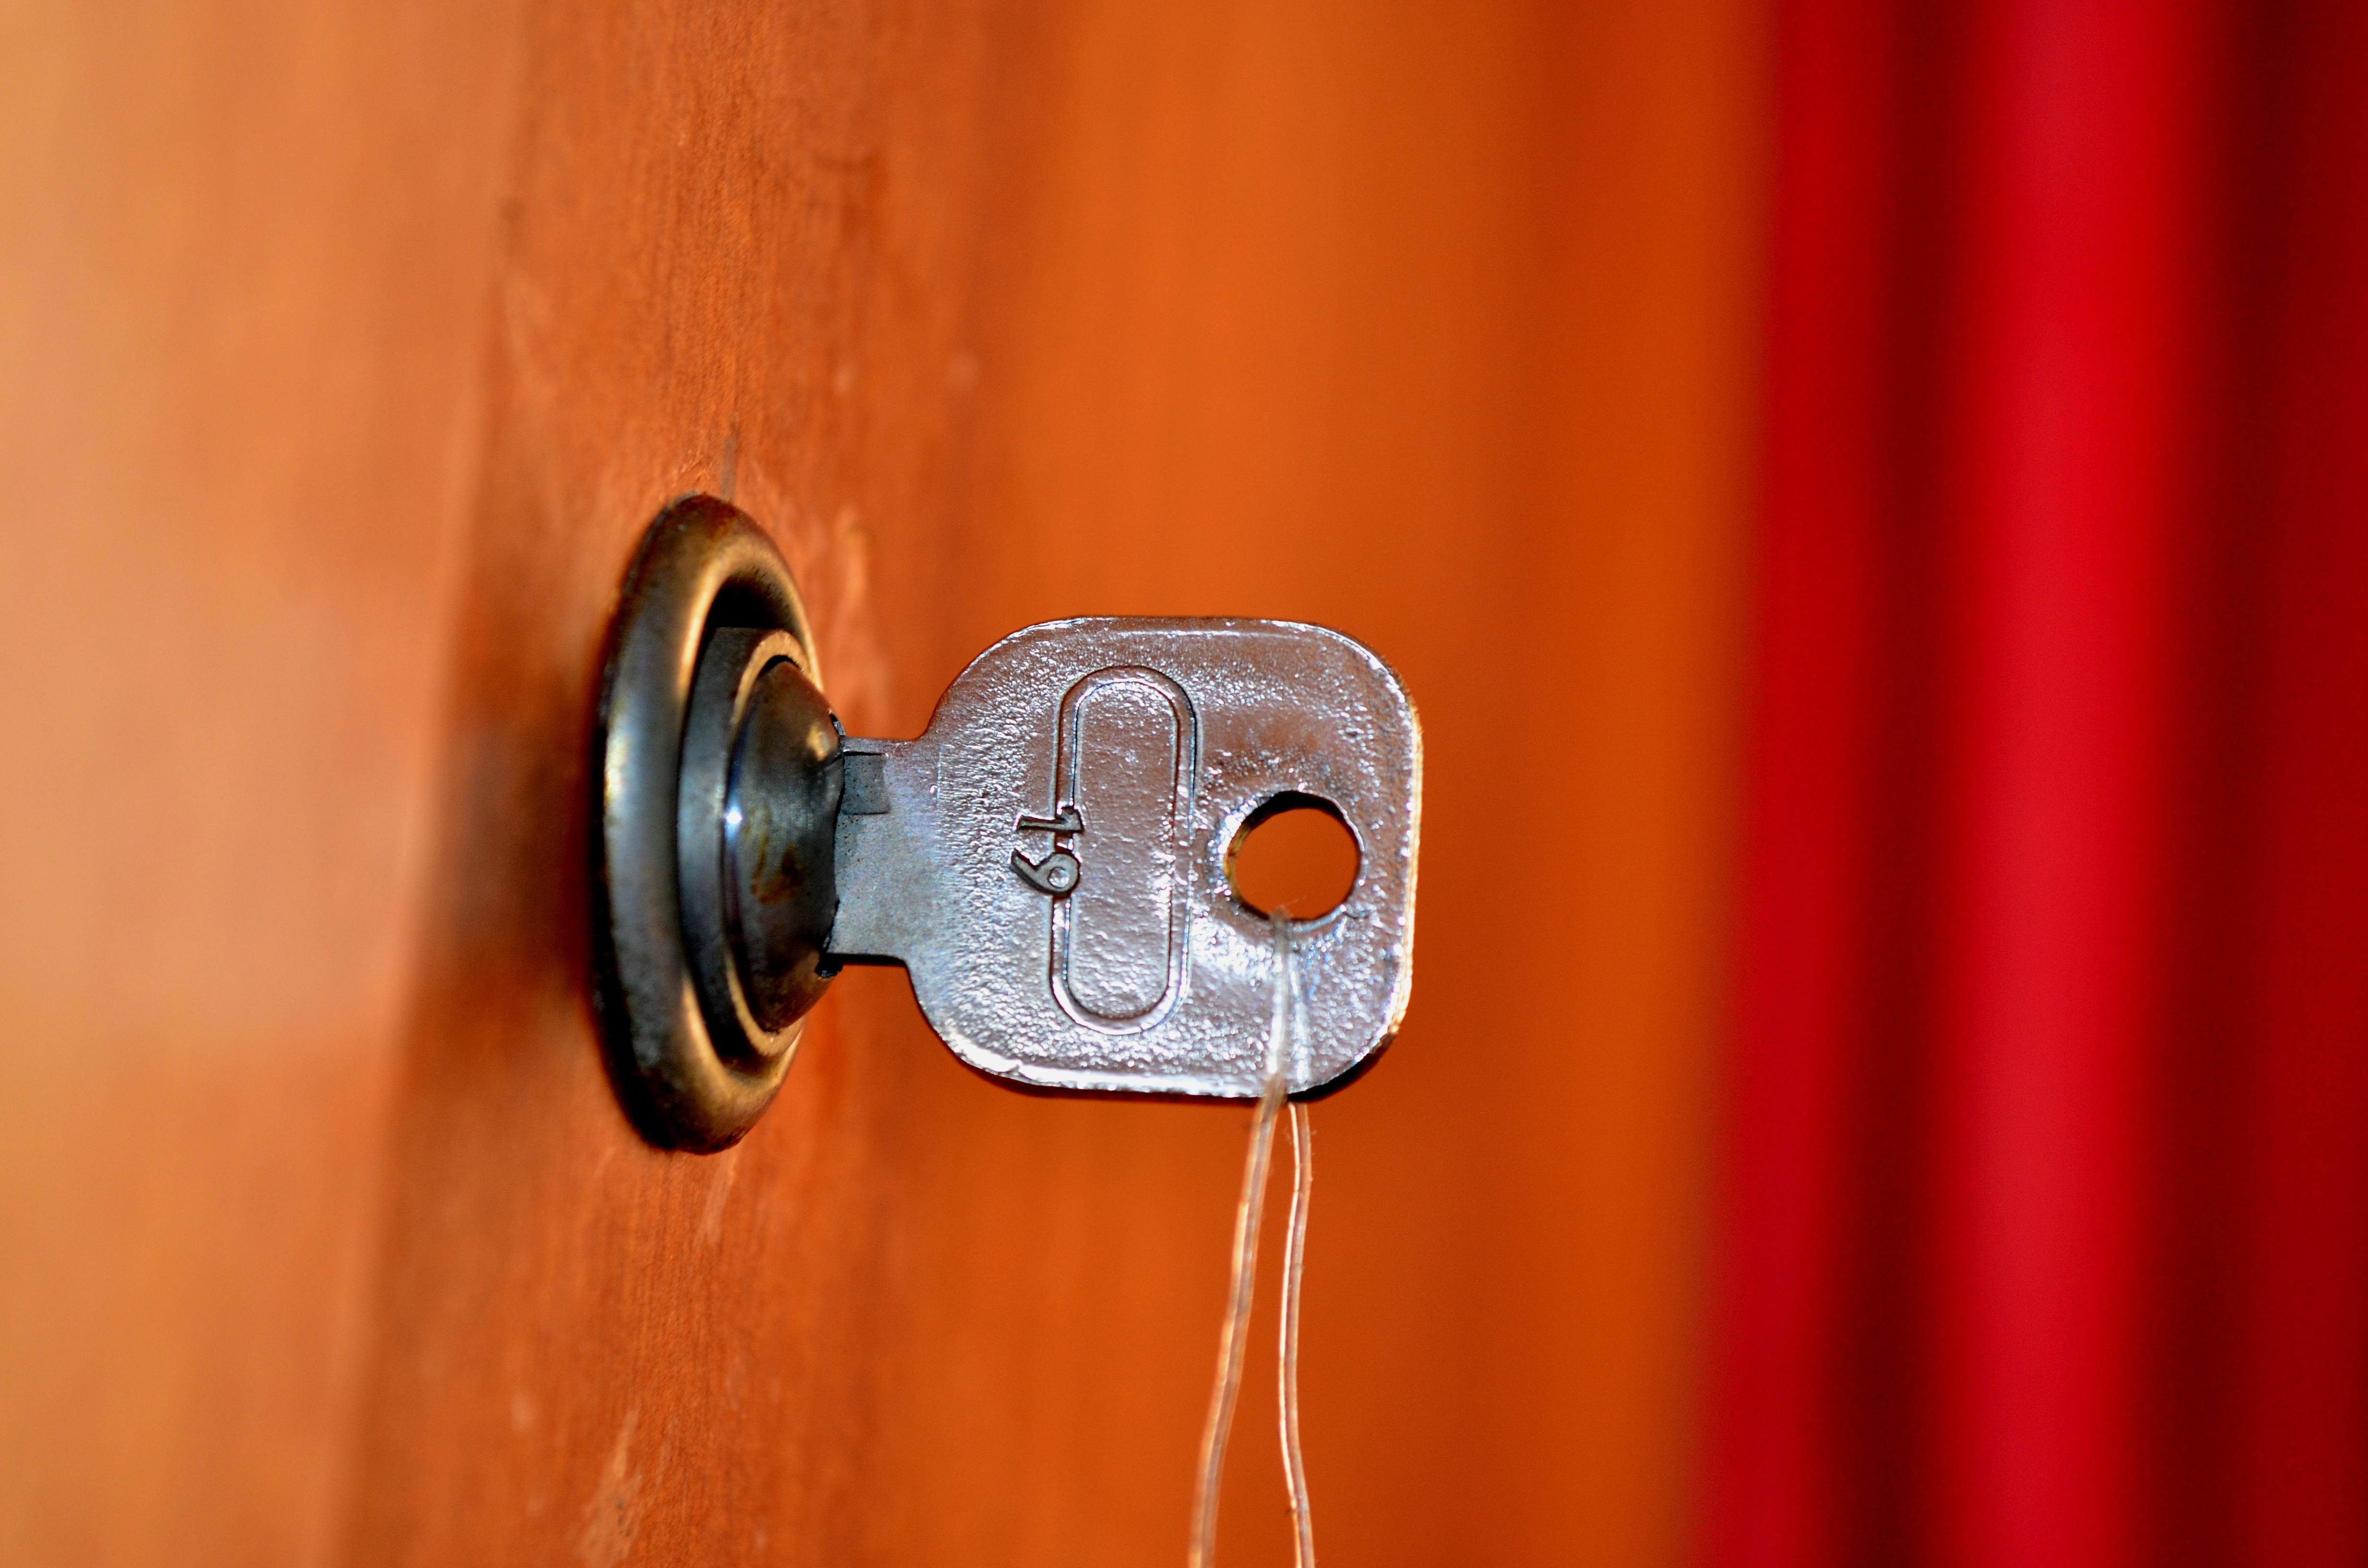 open guitar door security close up product keys lock keyhole locked unlock secure access & Free Images : open guitar door security close up product ...